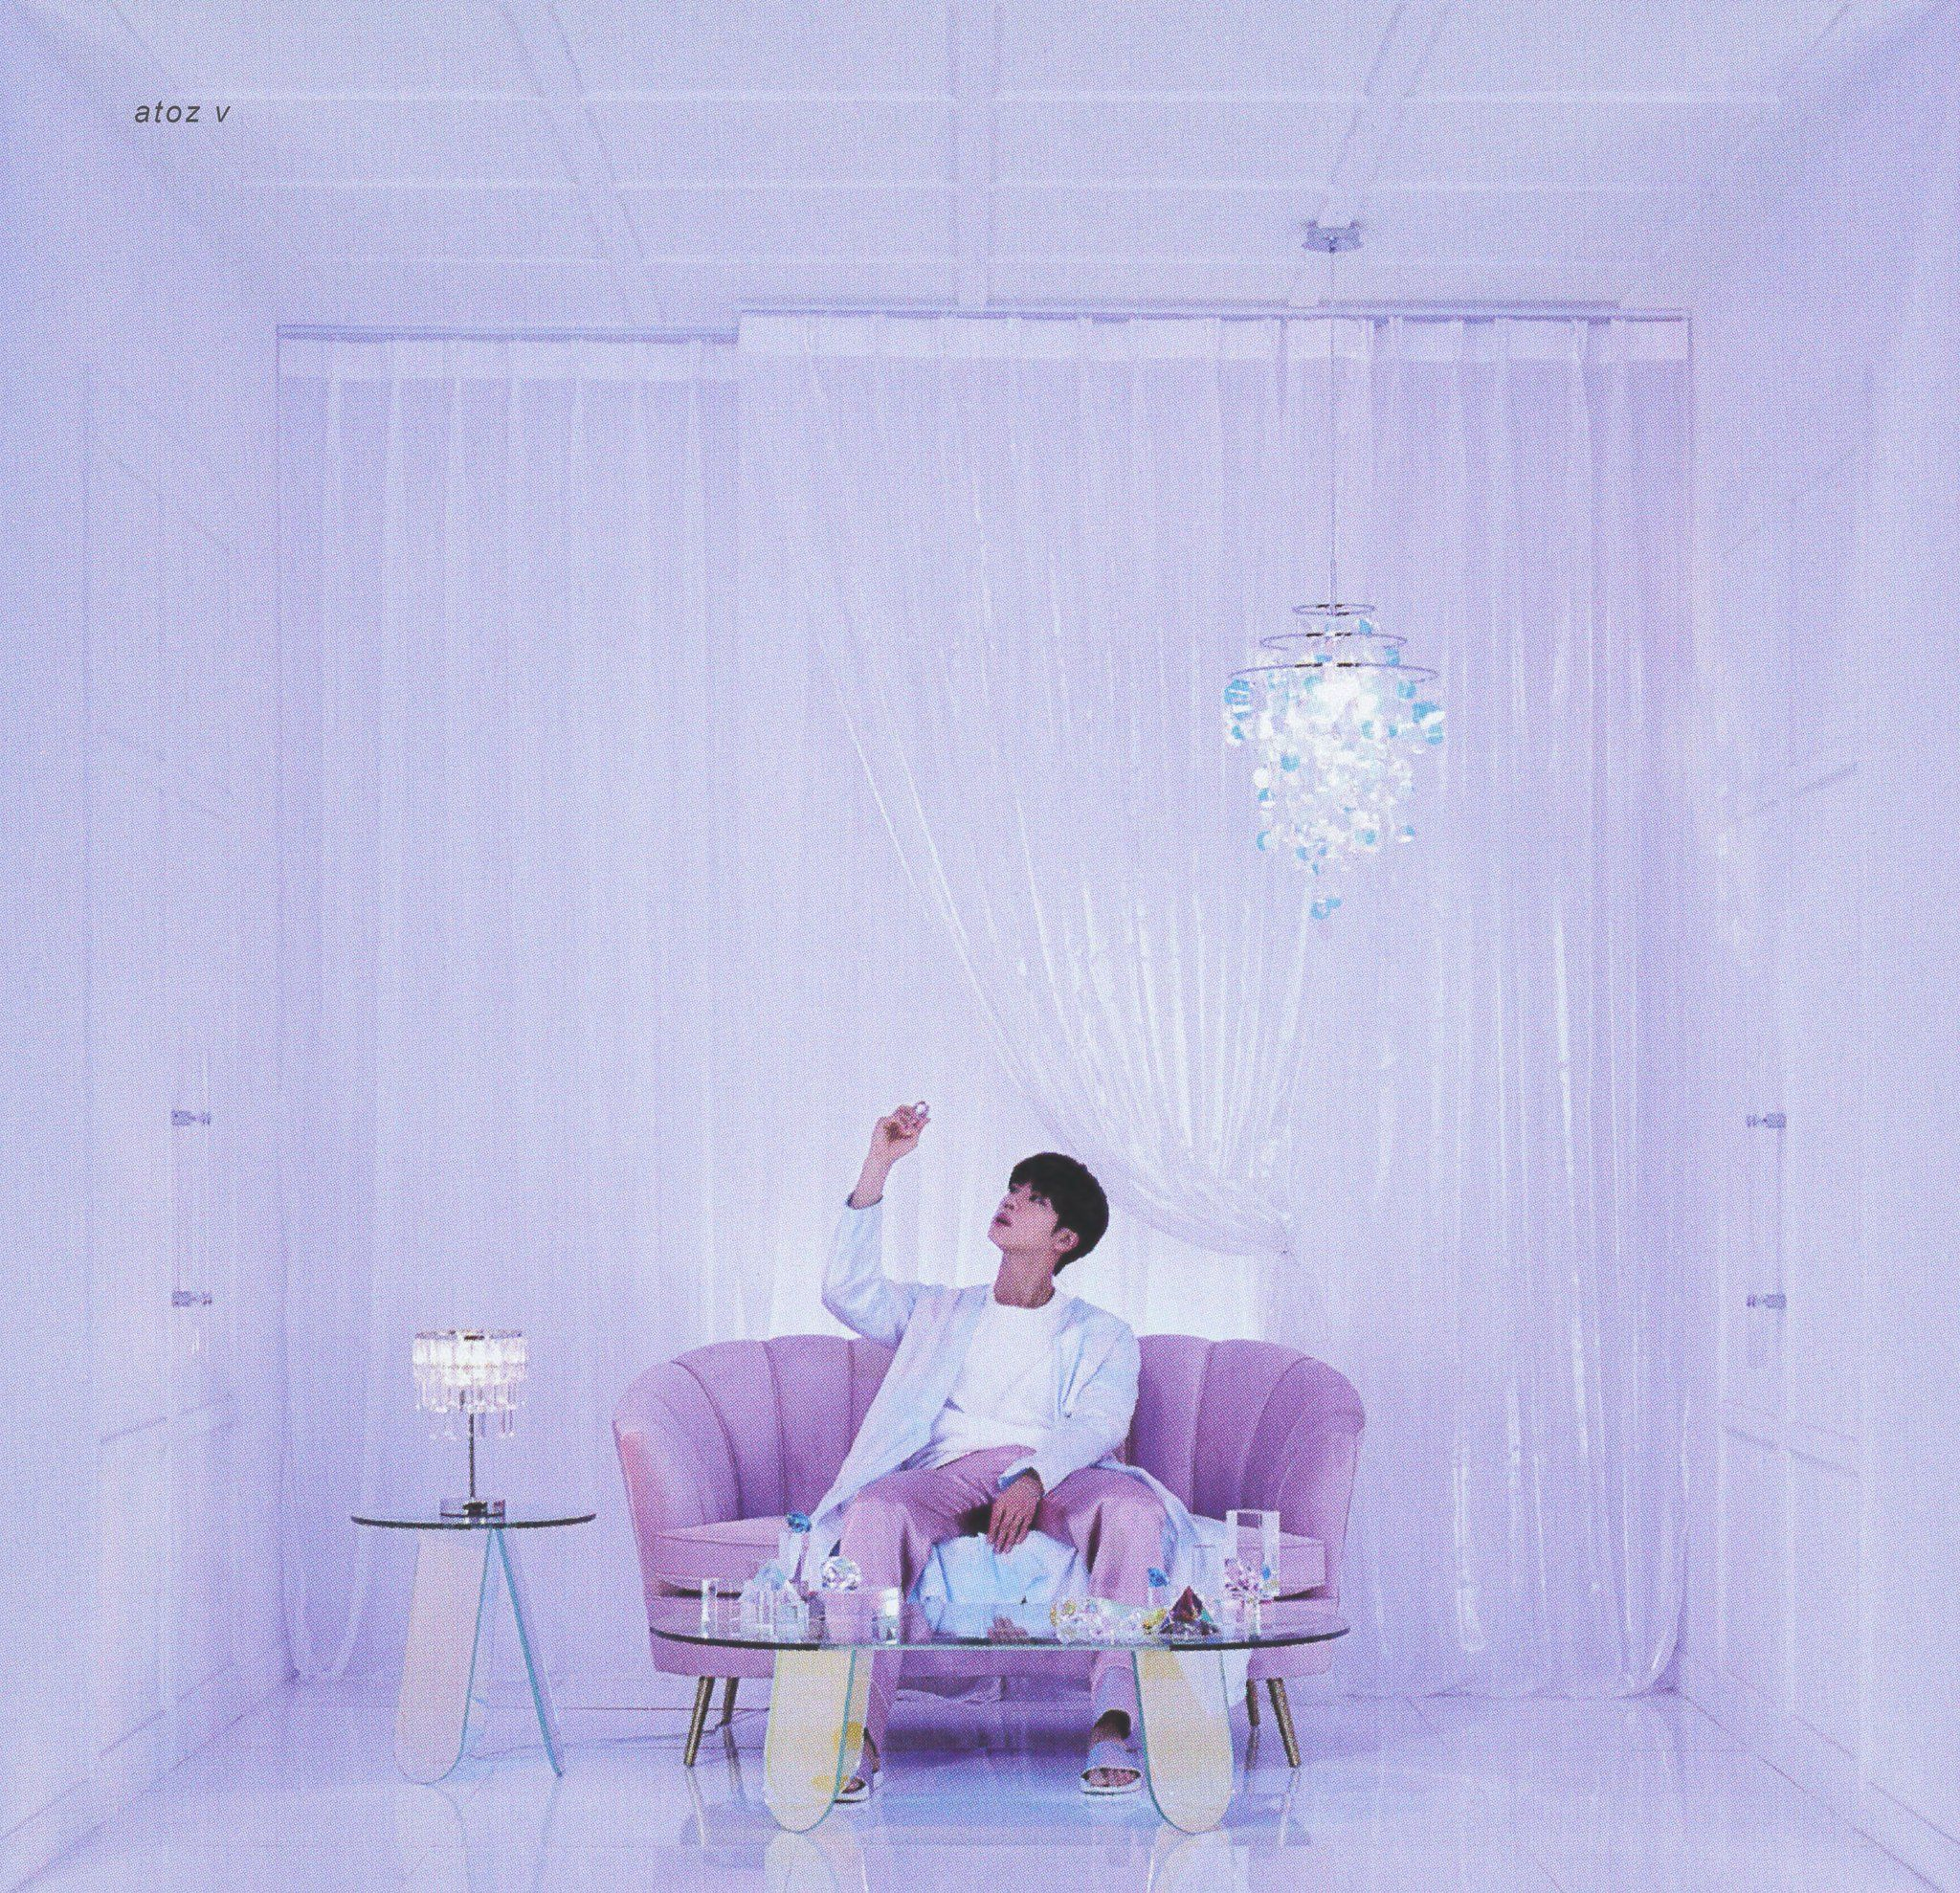 Atoz V On Twitter Seokjin Photoshoot Bts Worldwide Handsome Luxury bts room photo